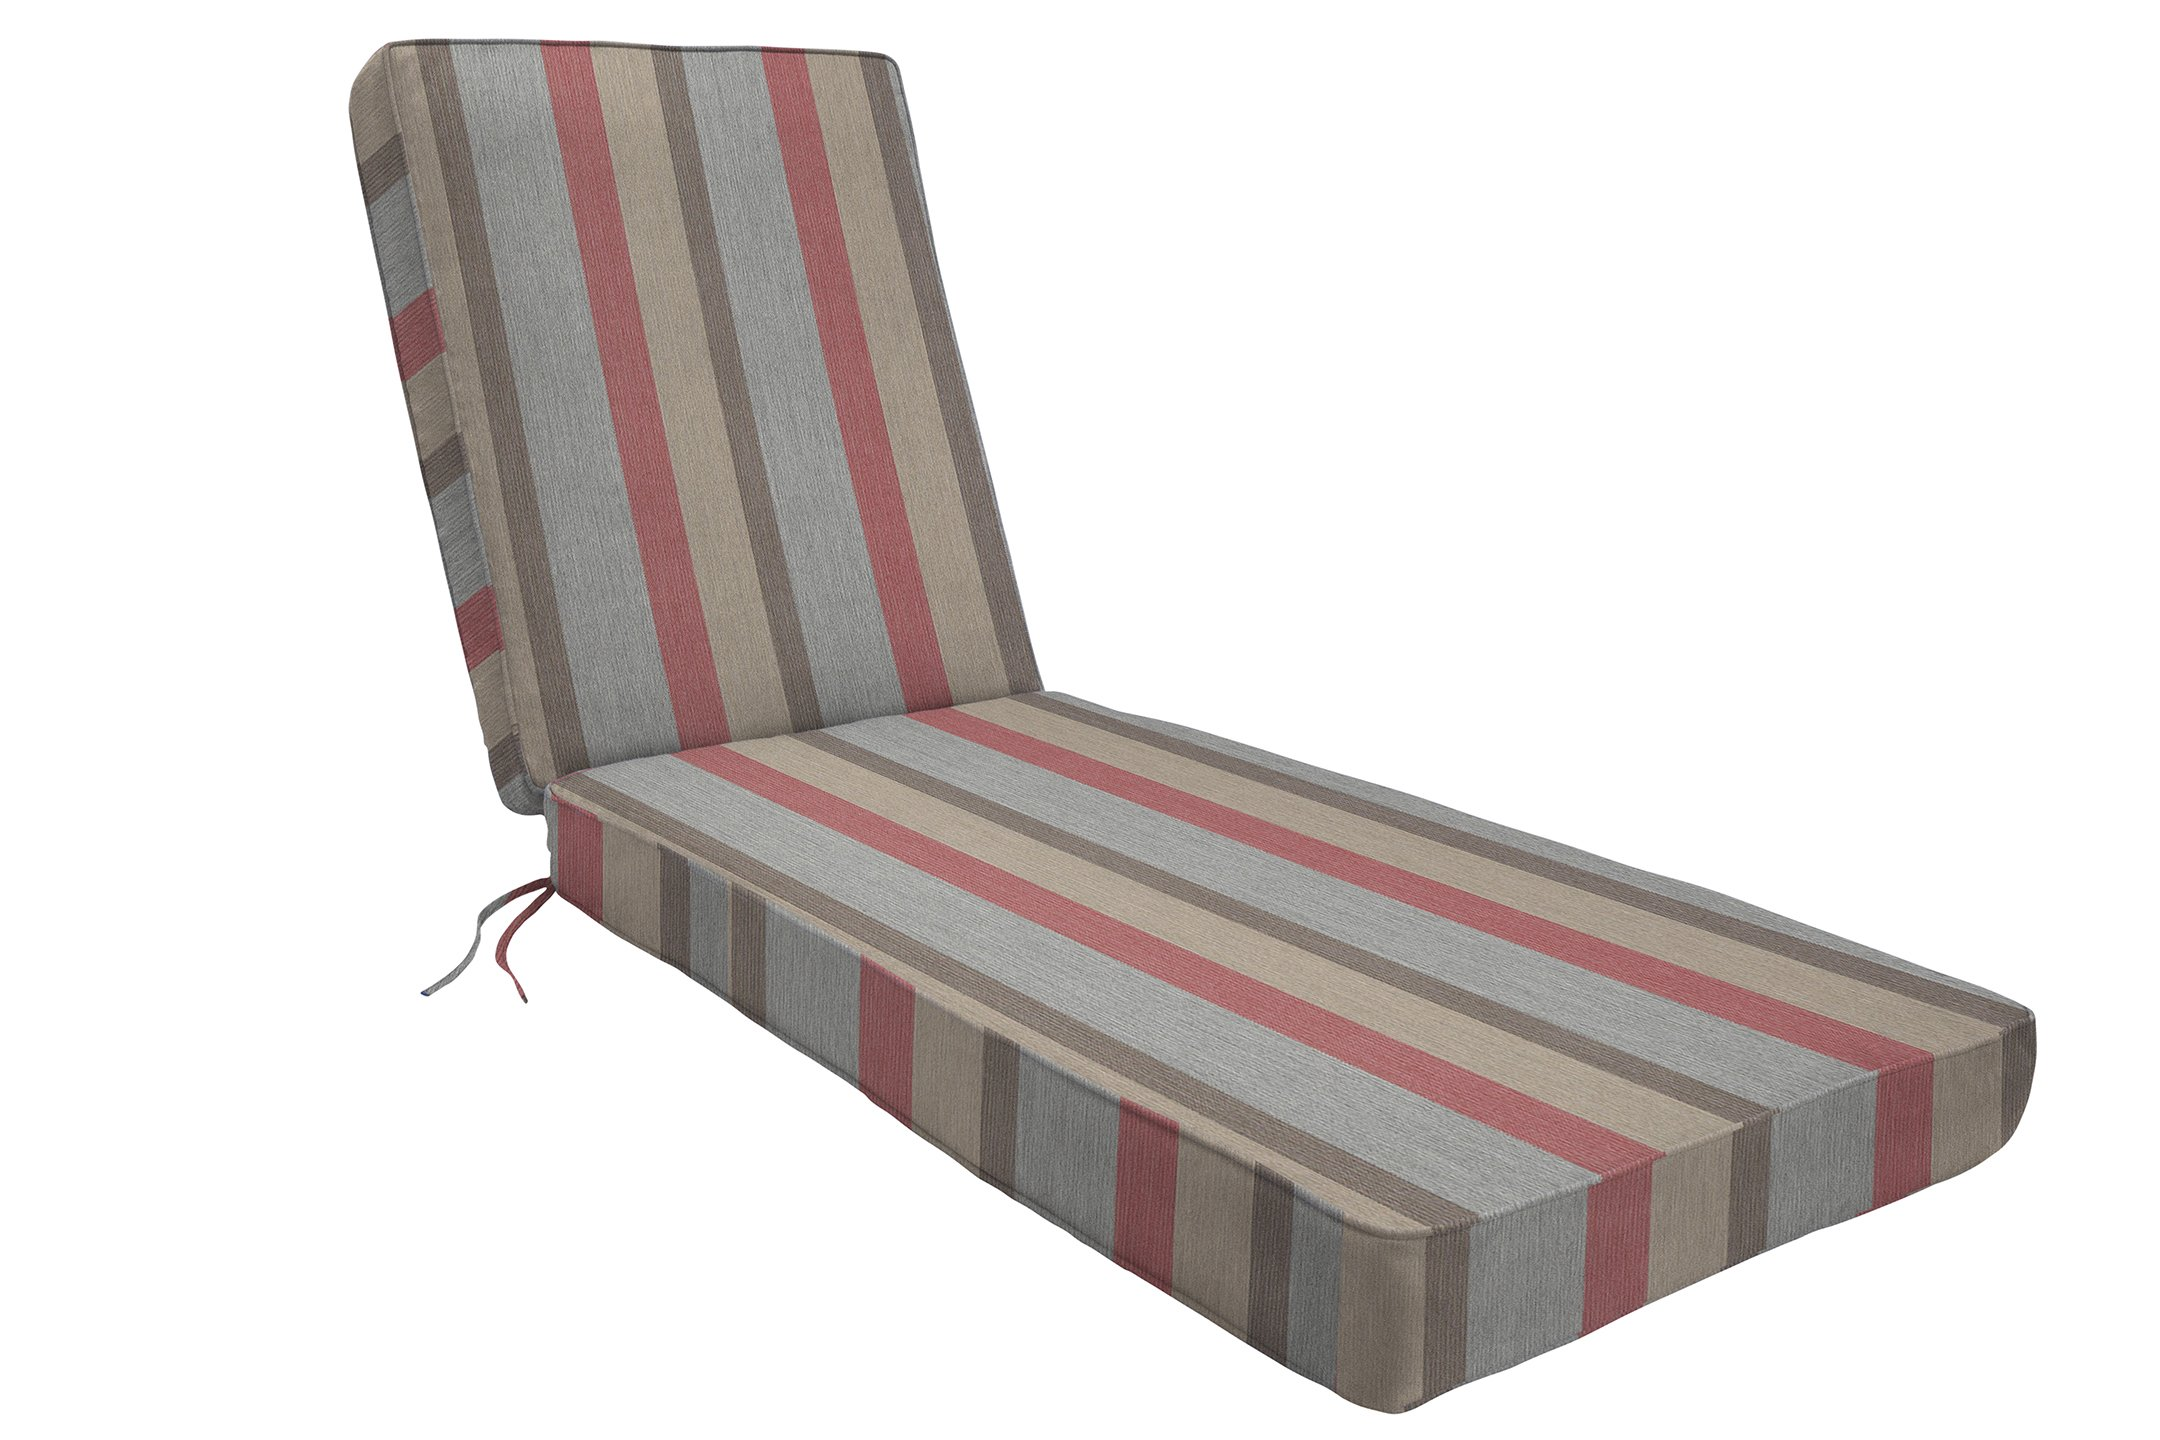 Eddie Bauer Home Chaise Double Piped 26'' W x 82'' L x 2.5'' H, Gateway Blush